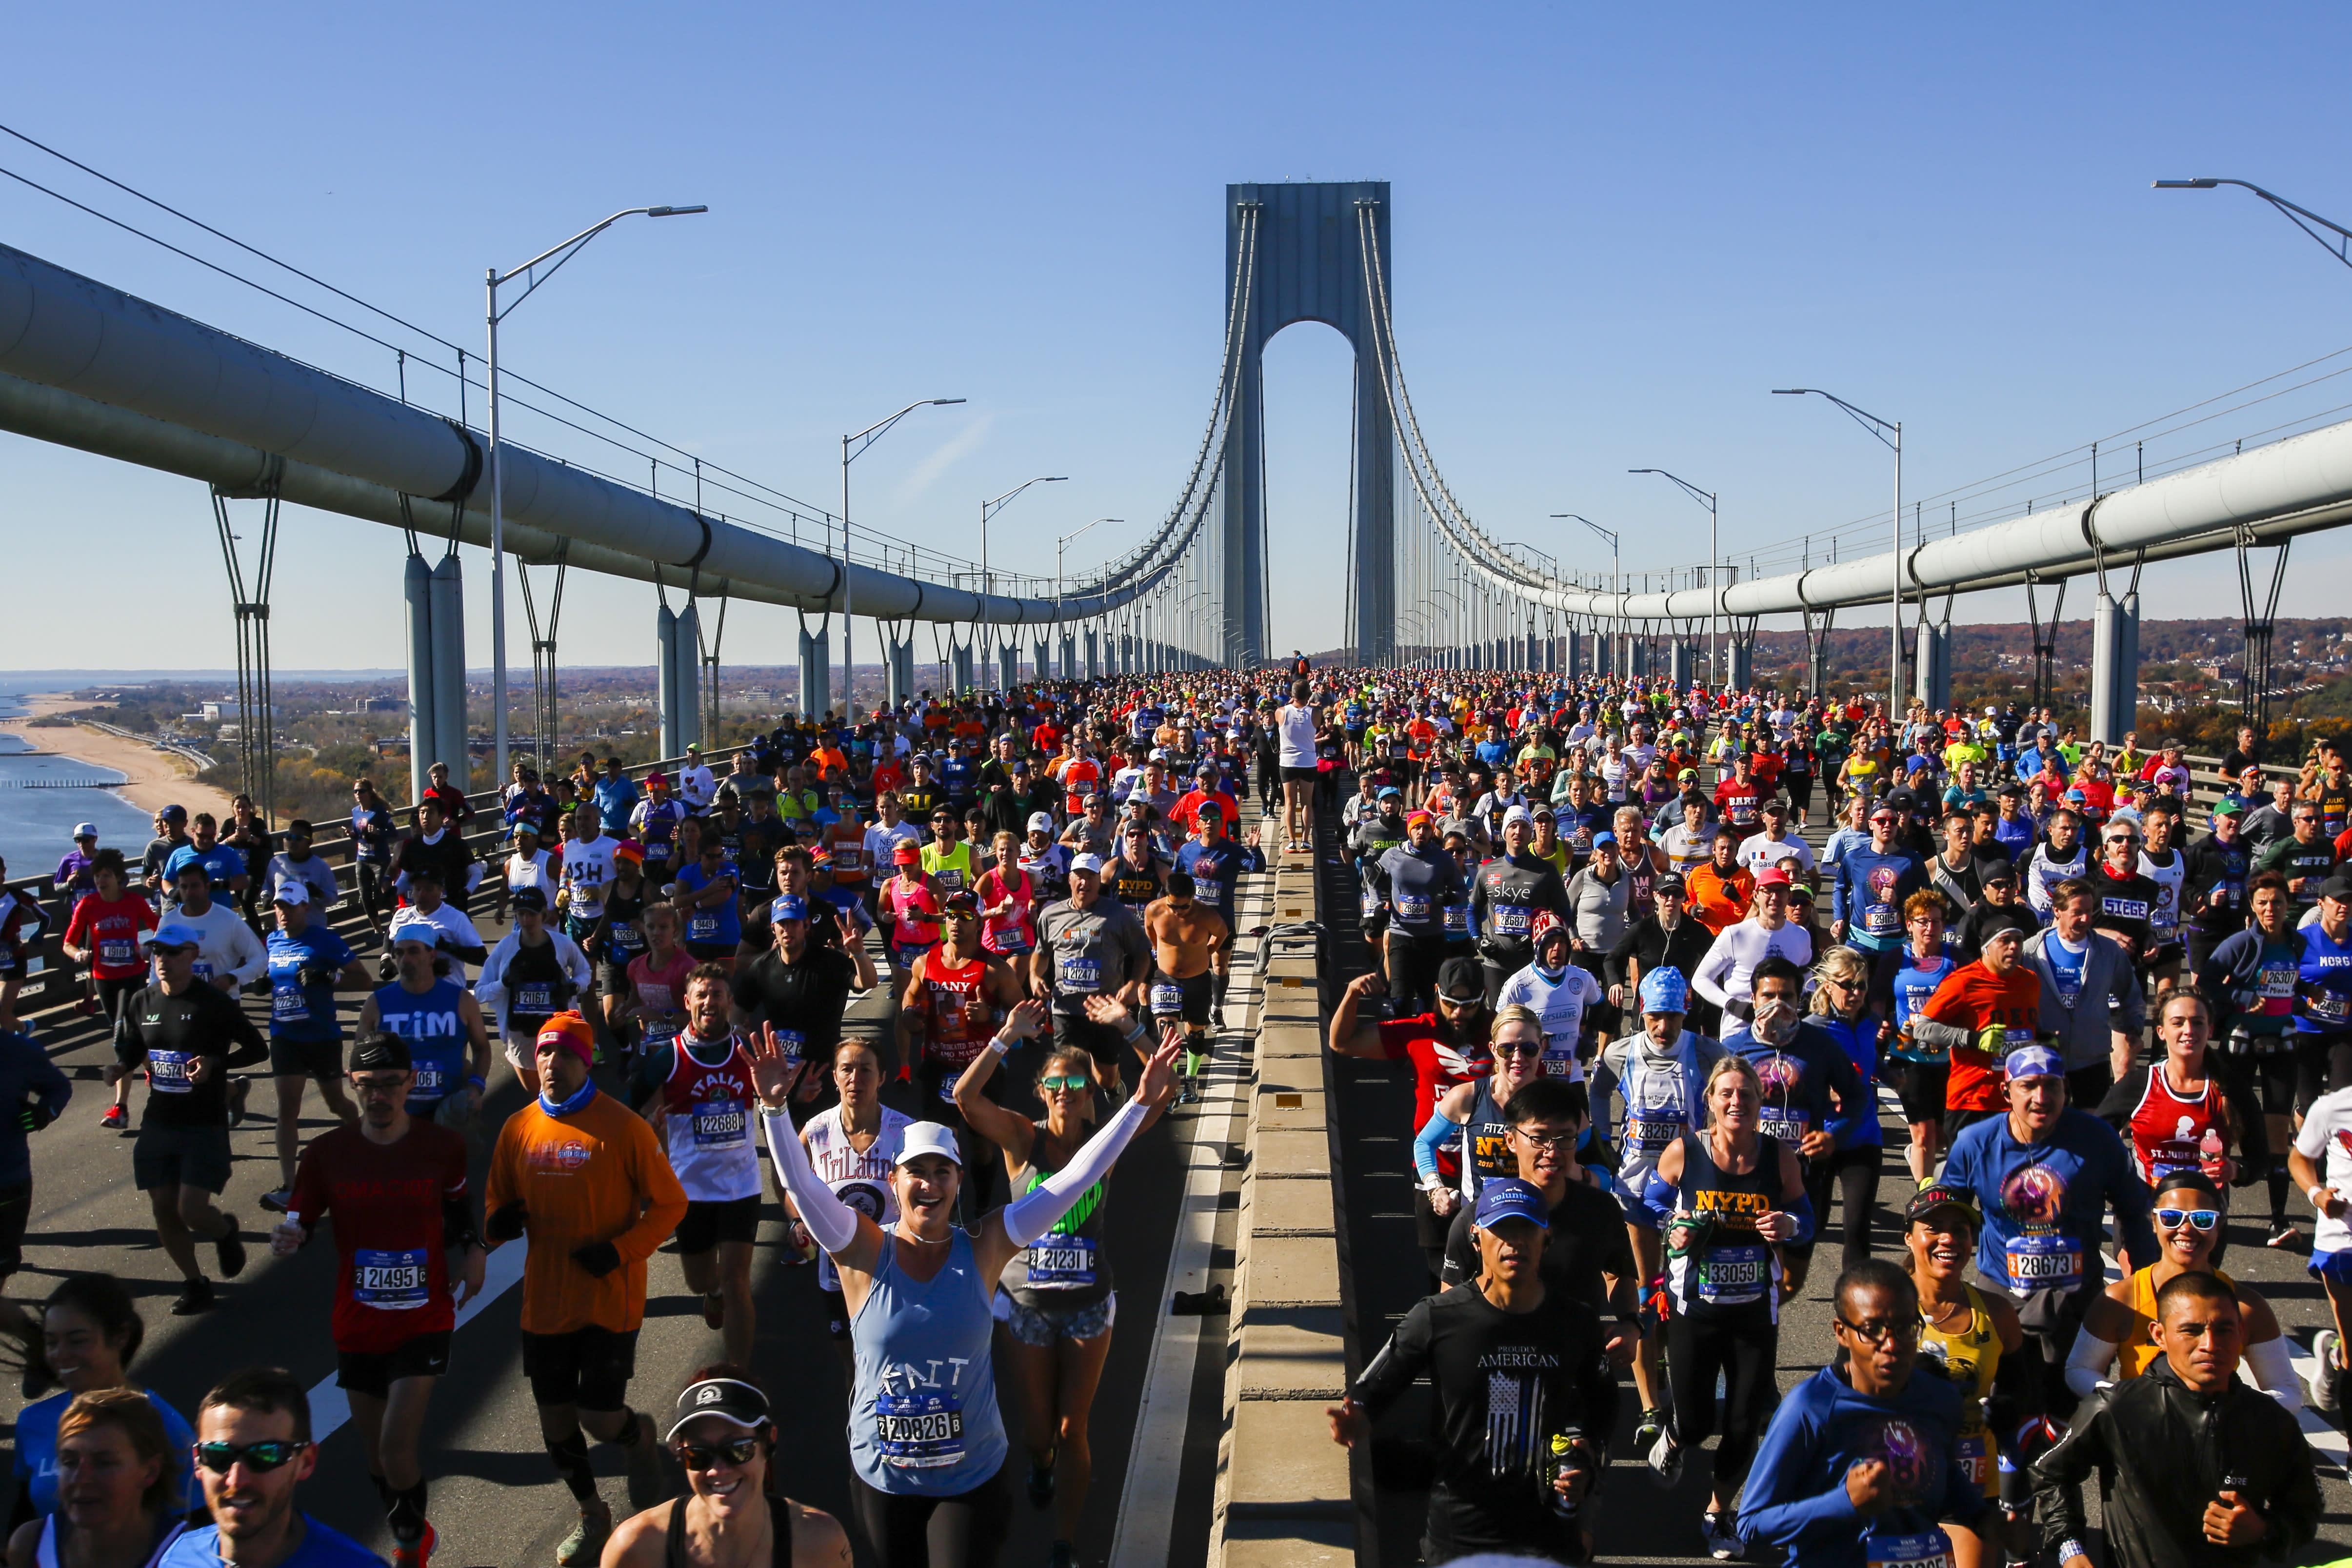 <p>Runners cross the Verrazano-Narrows Bridge during the New York City Marathon, Nov. 4, 2018. (Photo: Eduardo Munoz Alvarez/AP) </p>